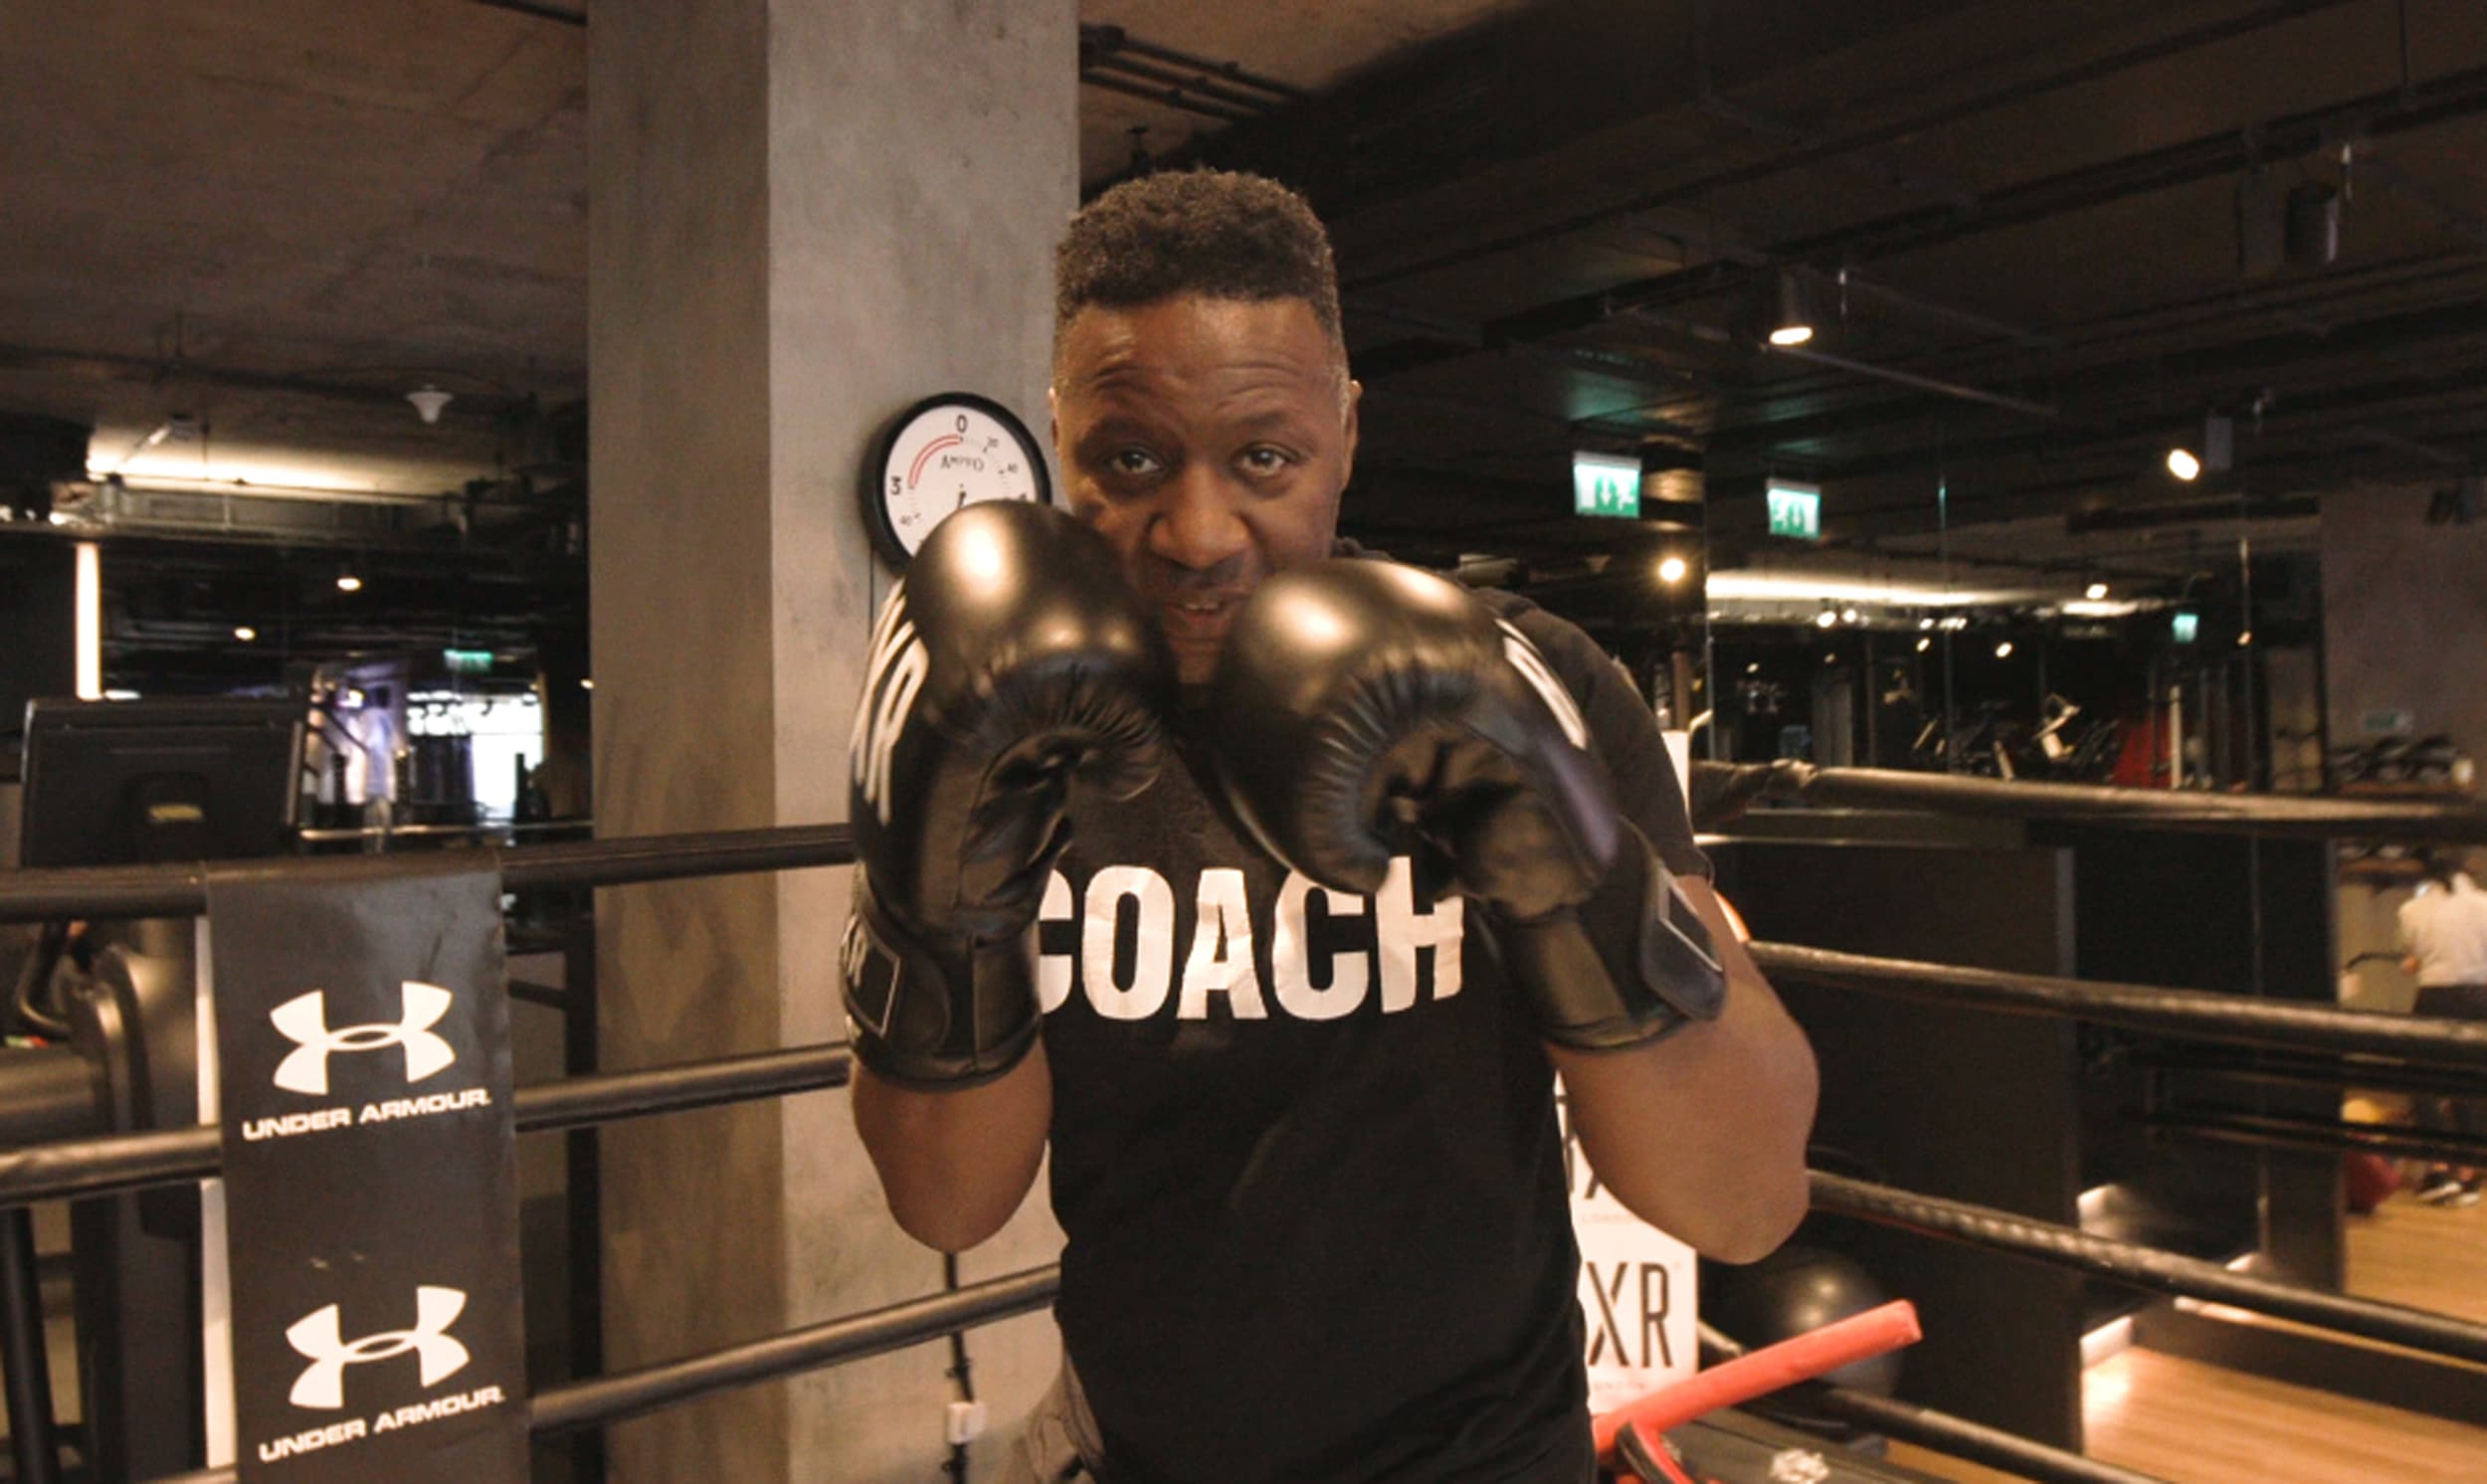 Boxercise Workout